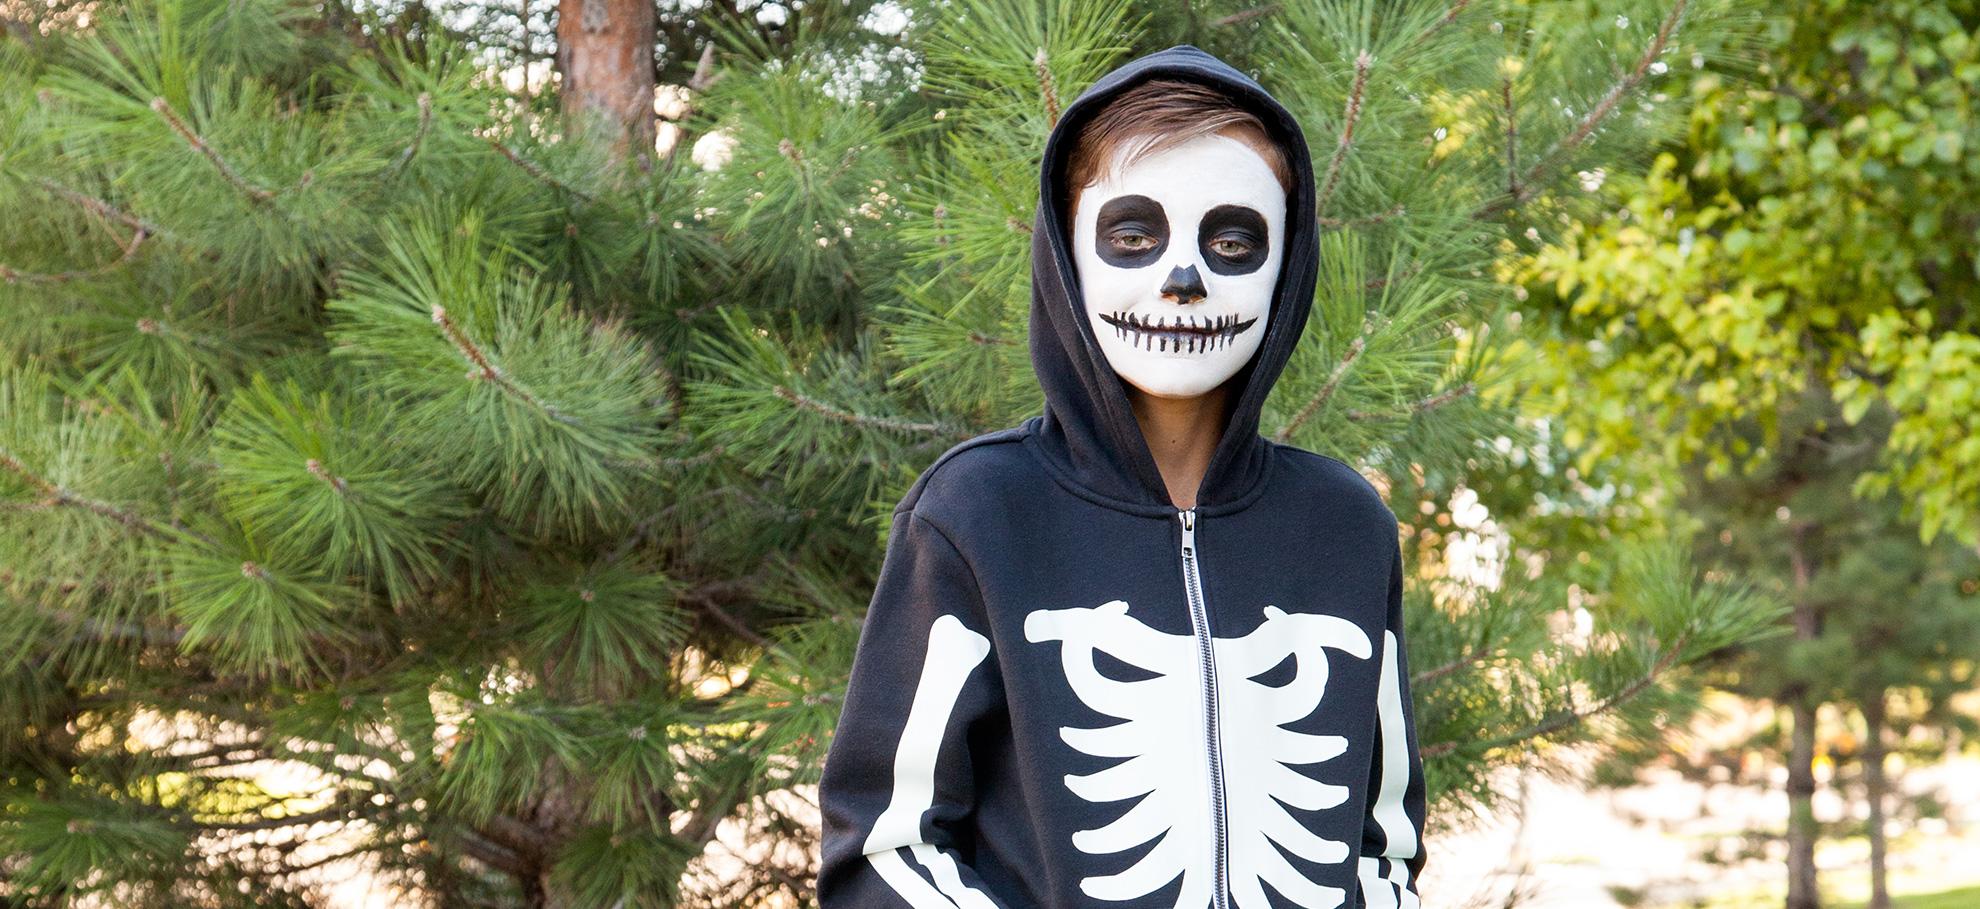 young boy wearing skeleton costume